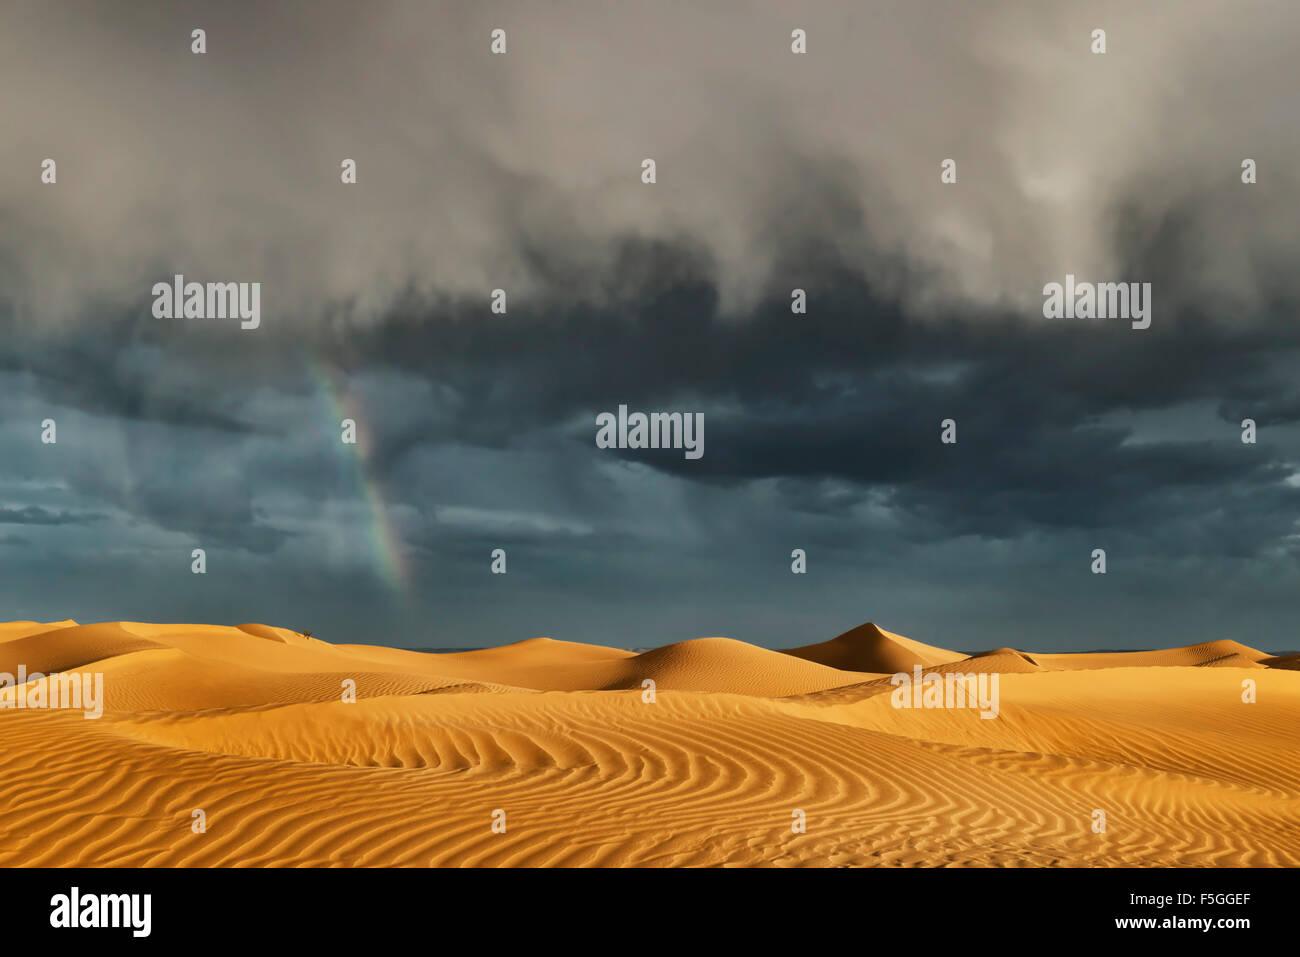 Sahara-Sand-Dünen mit stürmischen, bewölktem Himmel und Regenbogen. Stockbild